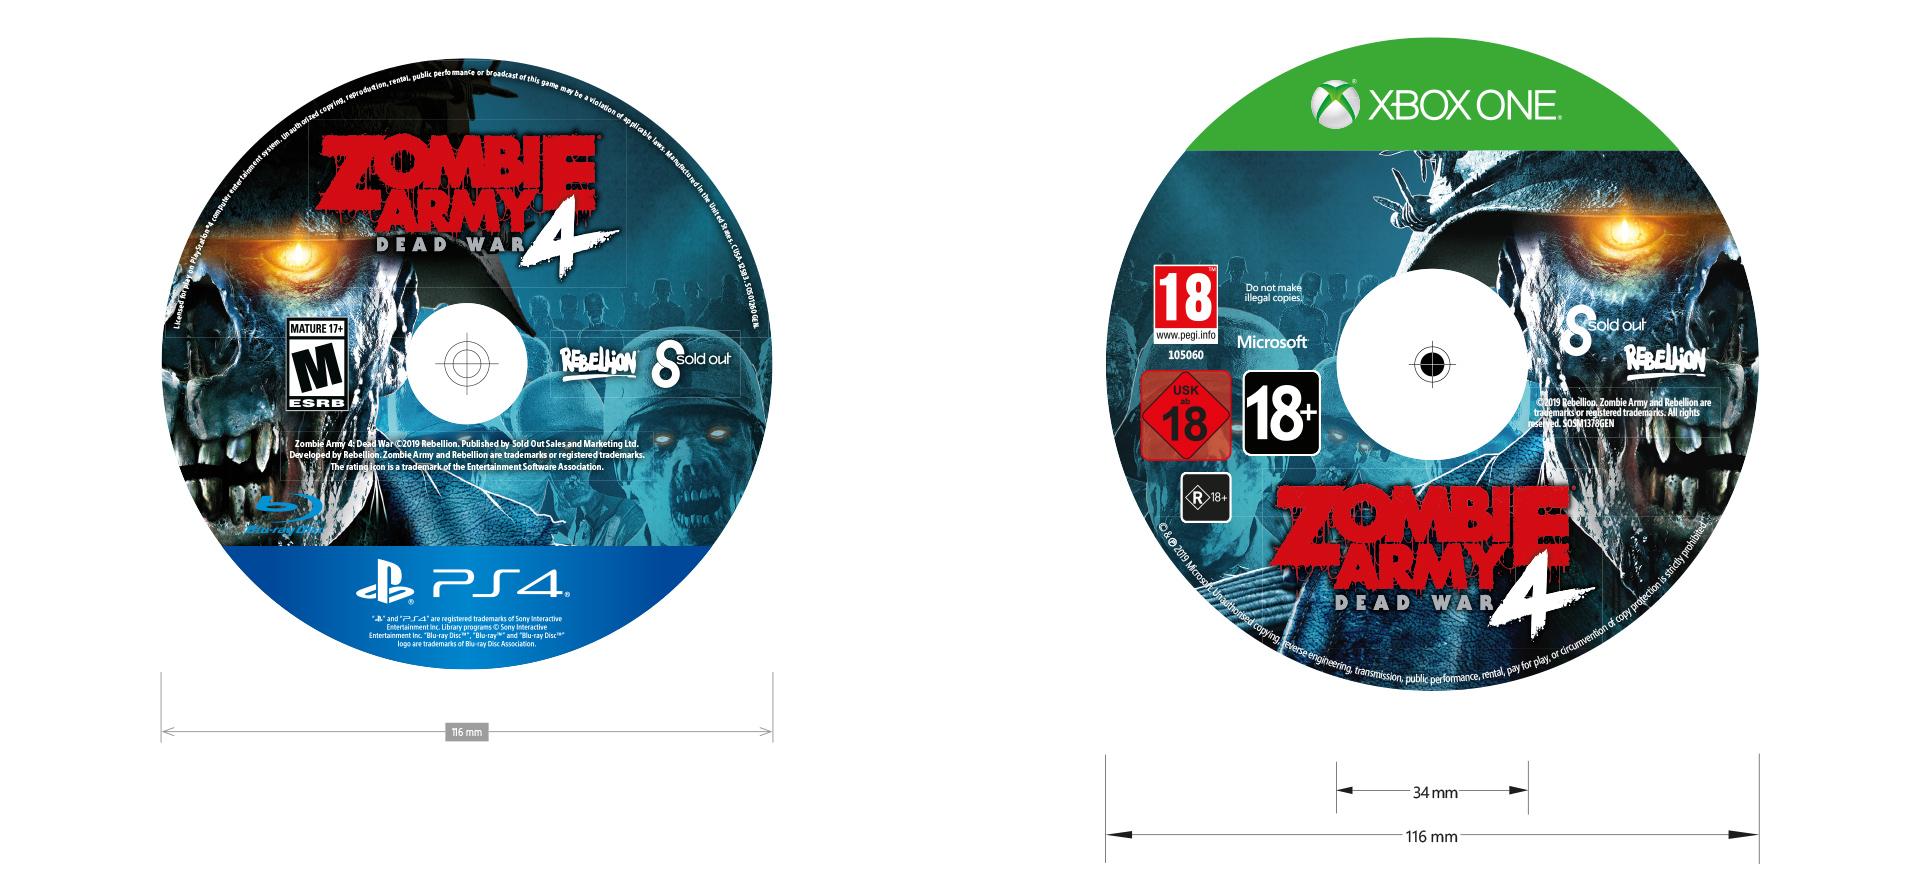 discs-packaging-repro-packaging-artwork